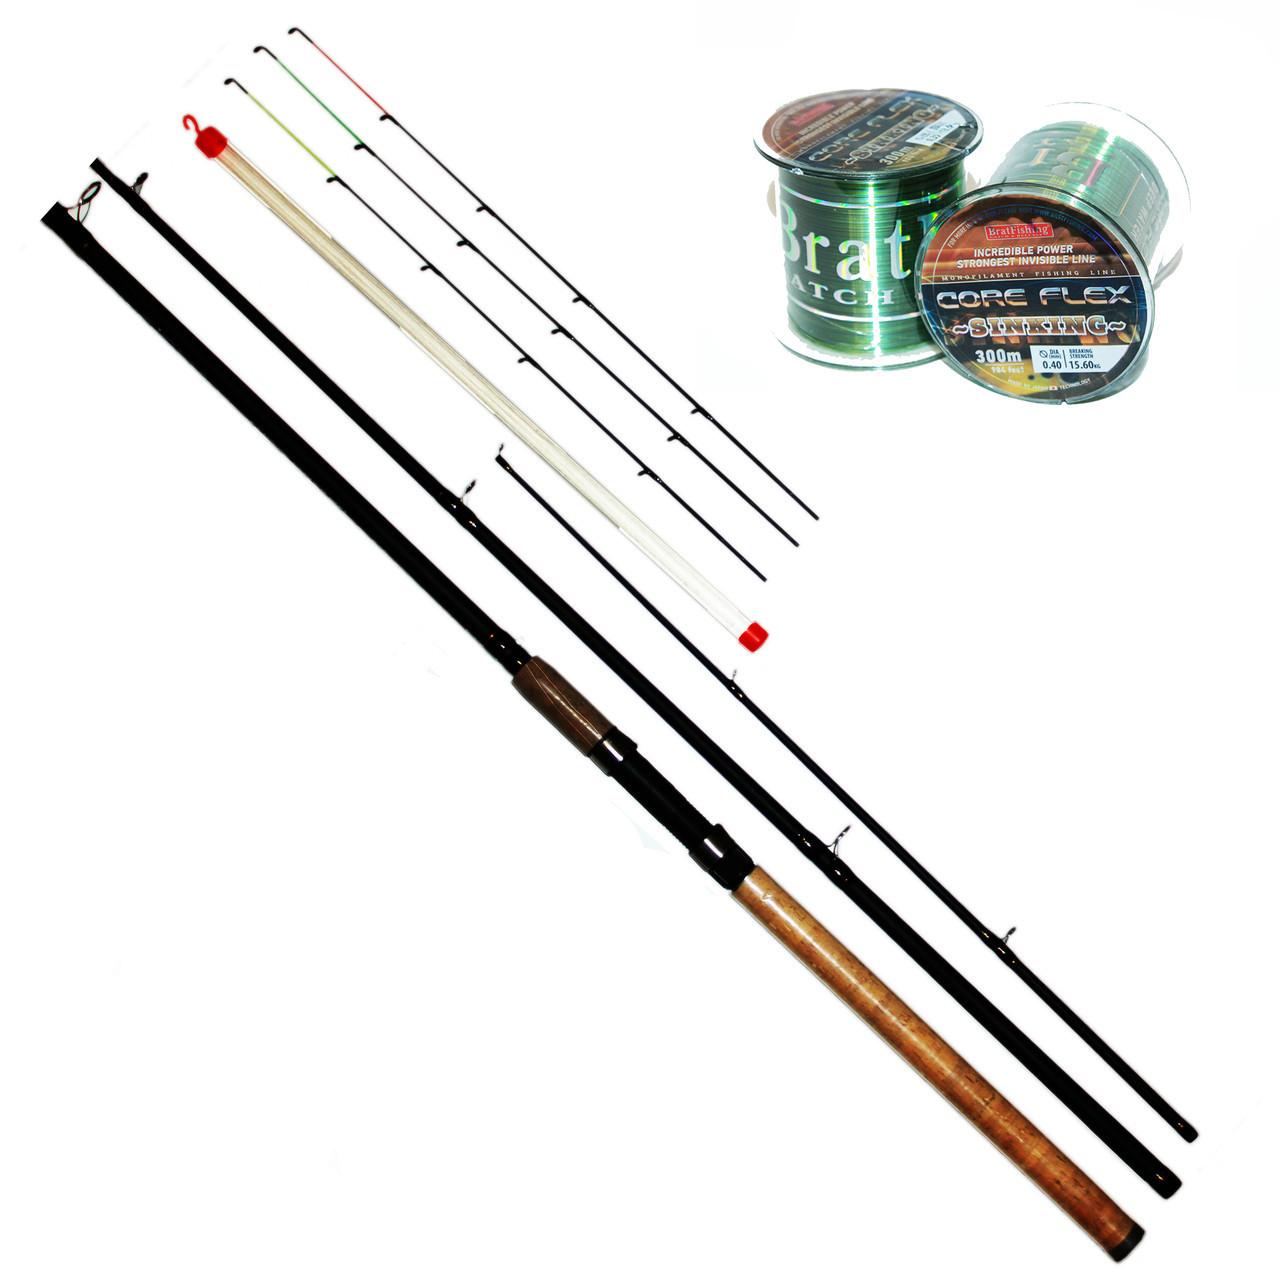 Фидерное удилище Bratfishing TAIPAN FEEDER +3 tips / 3.0M / 80-180 g